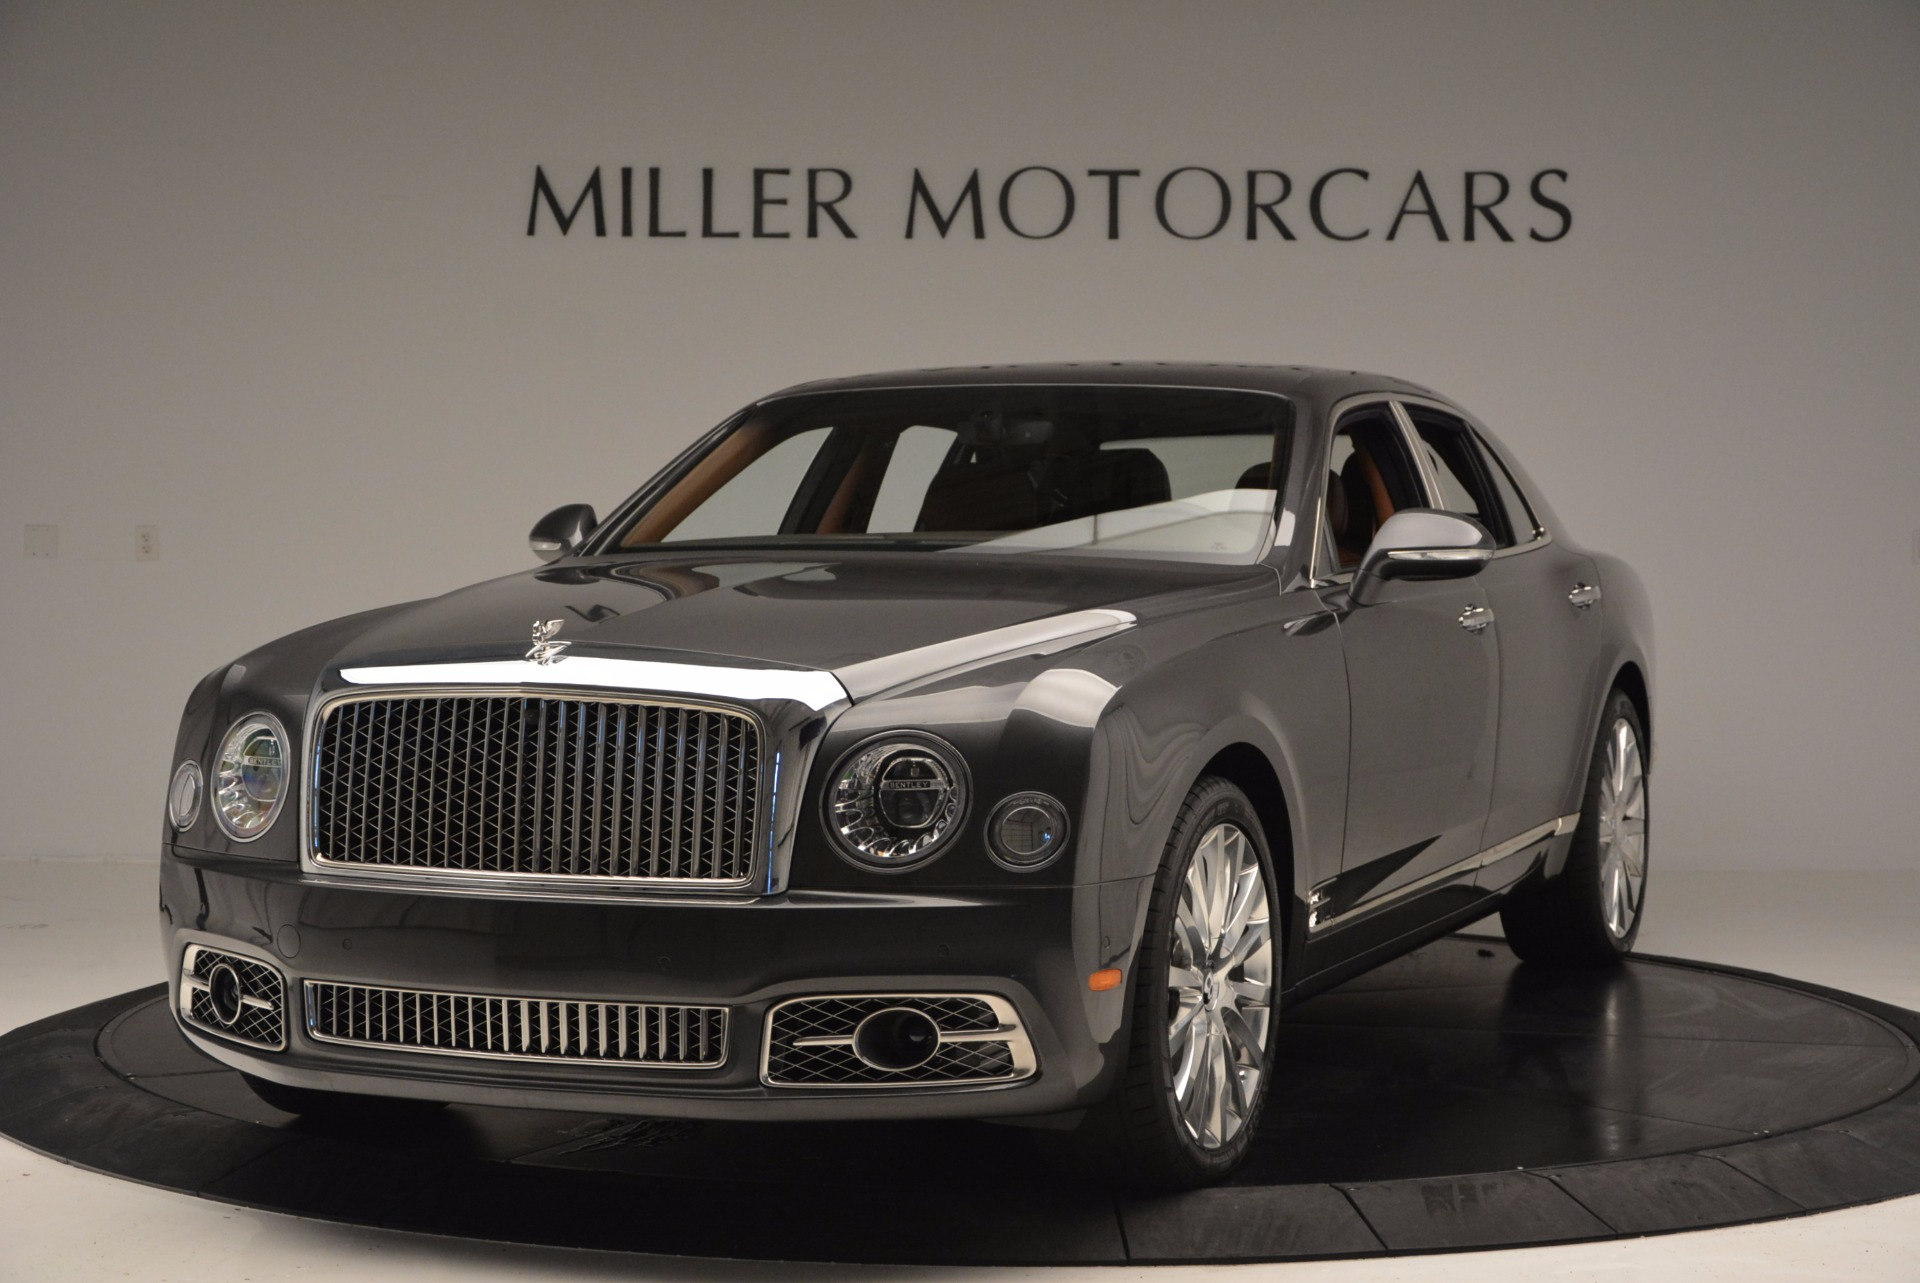 New 2017 Bentley Mulsanne  For Sale In Westport, CT 508_main